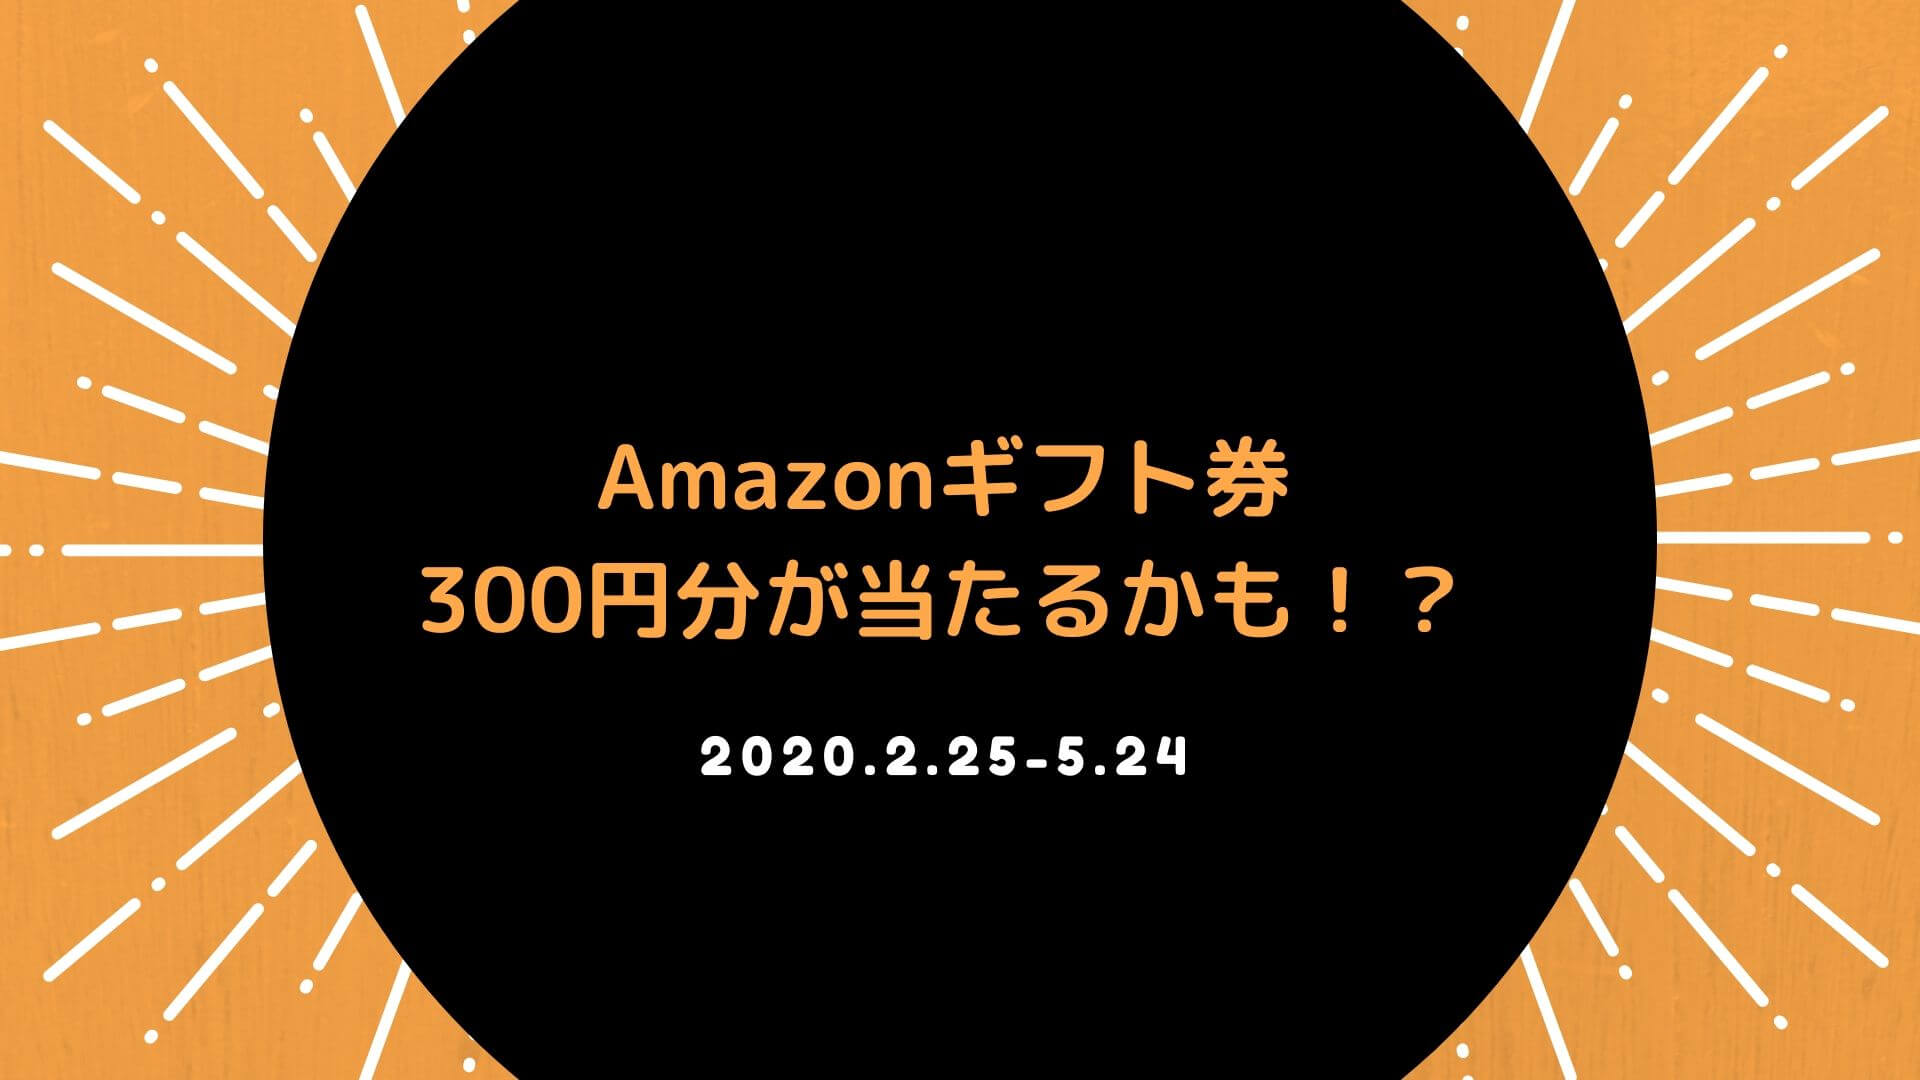 Amazonギフト券 300円分が当たるかも!?